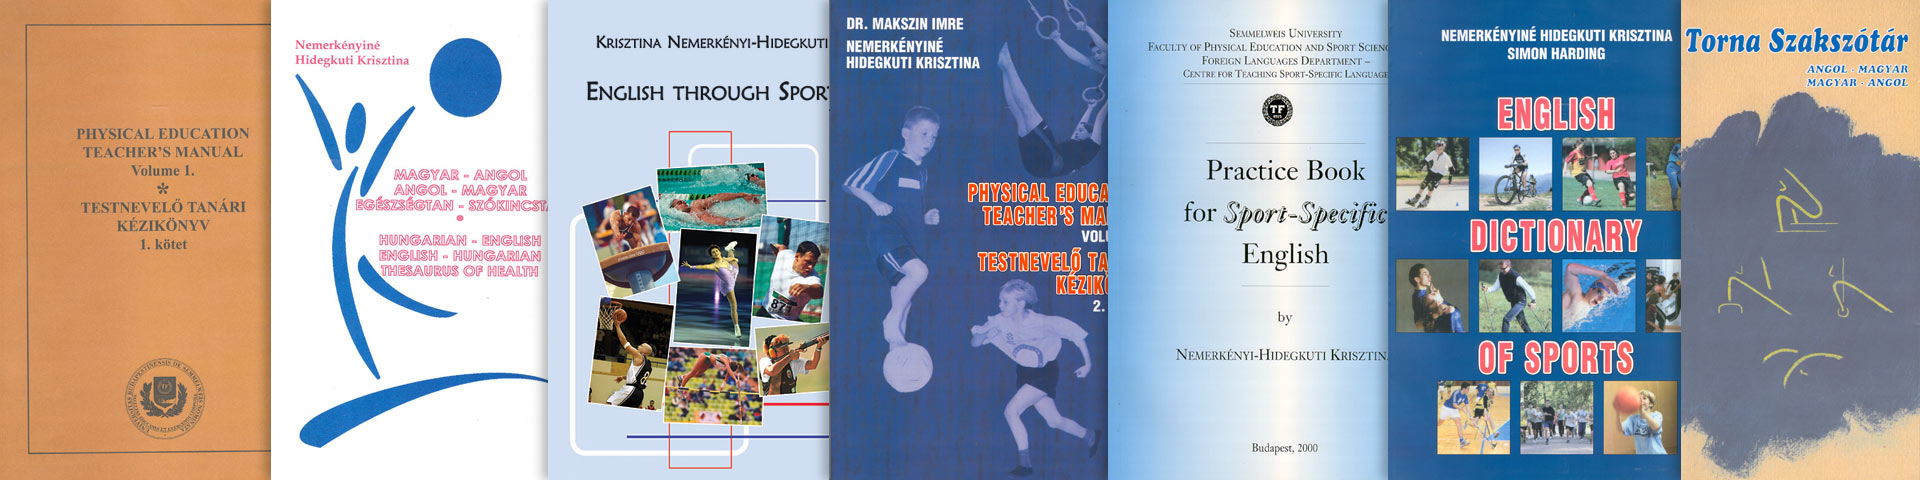 sportszaknyelvi-lektoratus-2